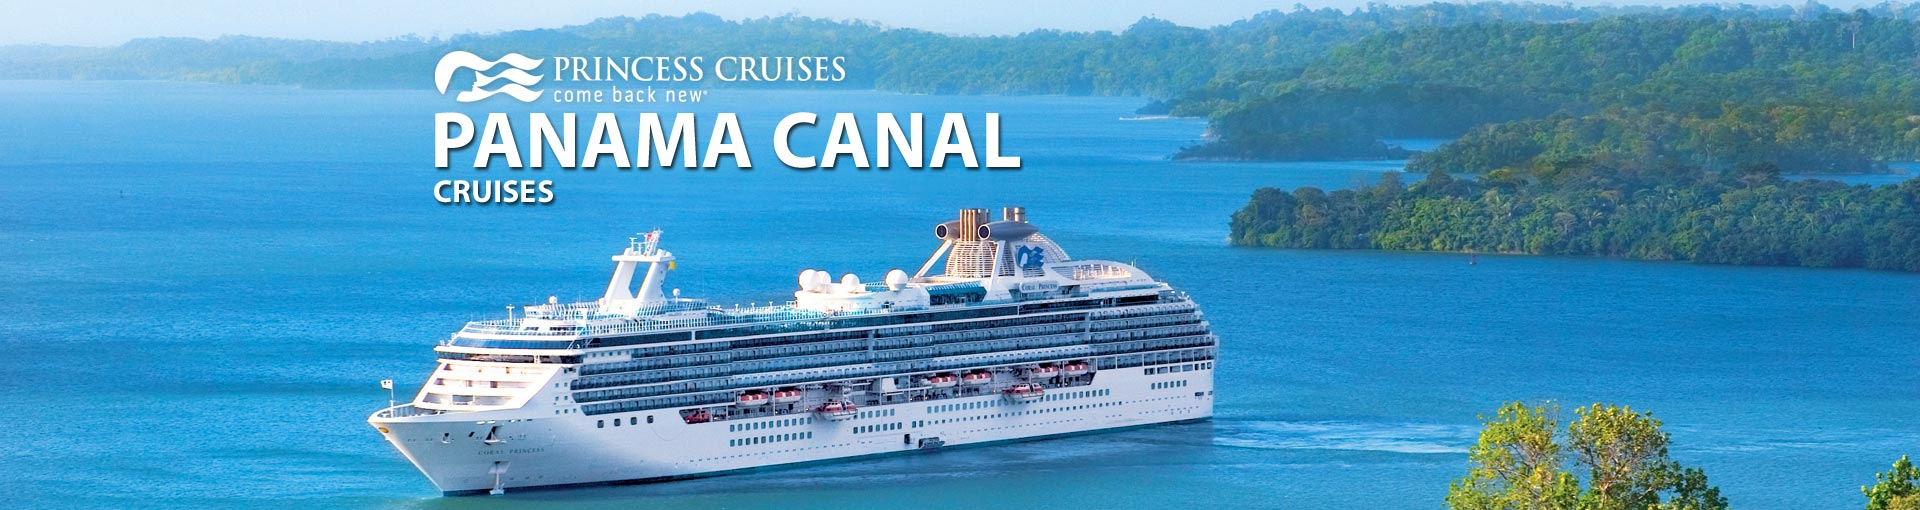 Princess Panama Canal Cruises